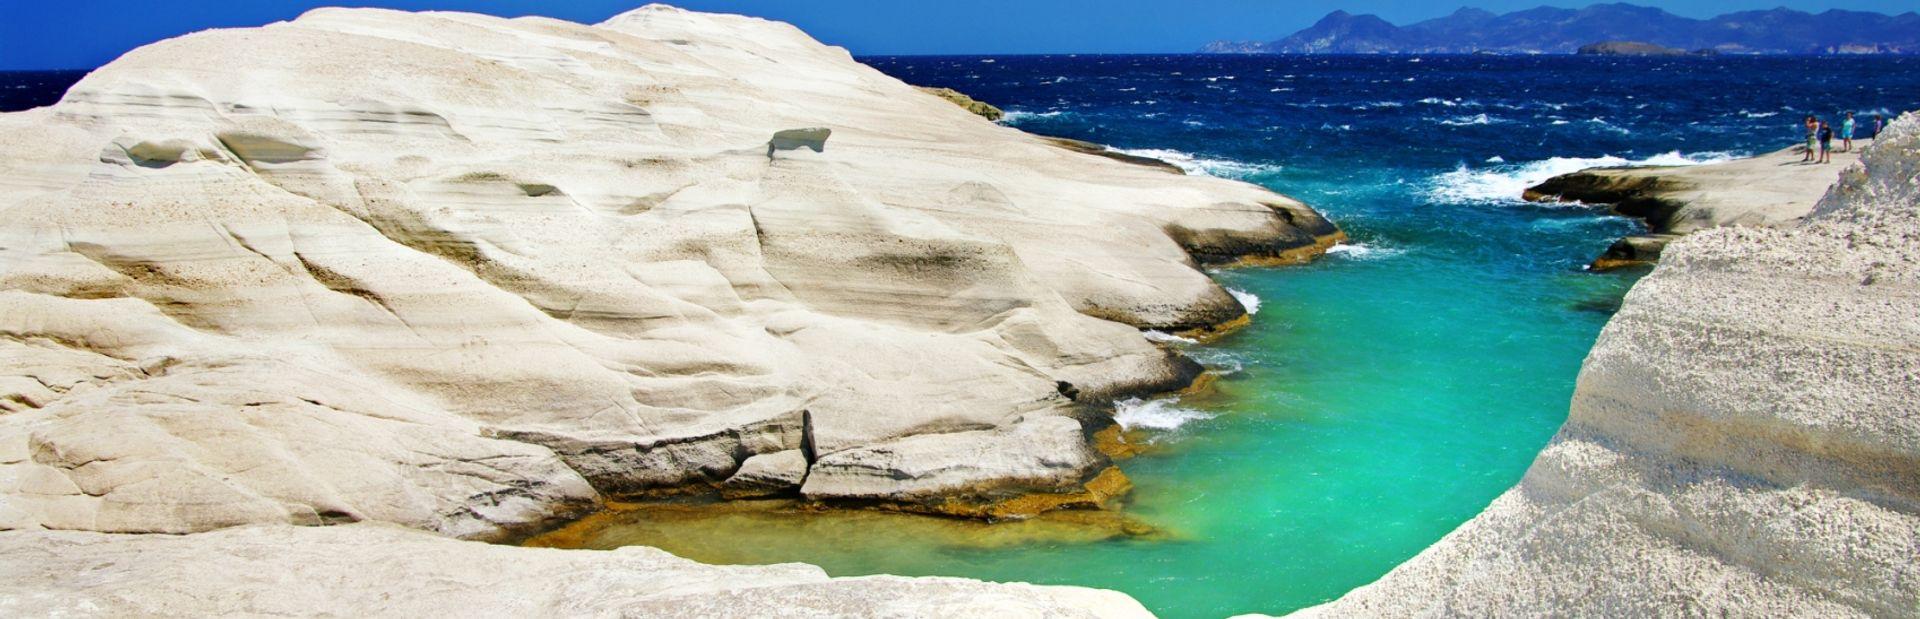 Cyclades Islands photo tour